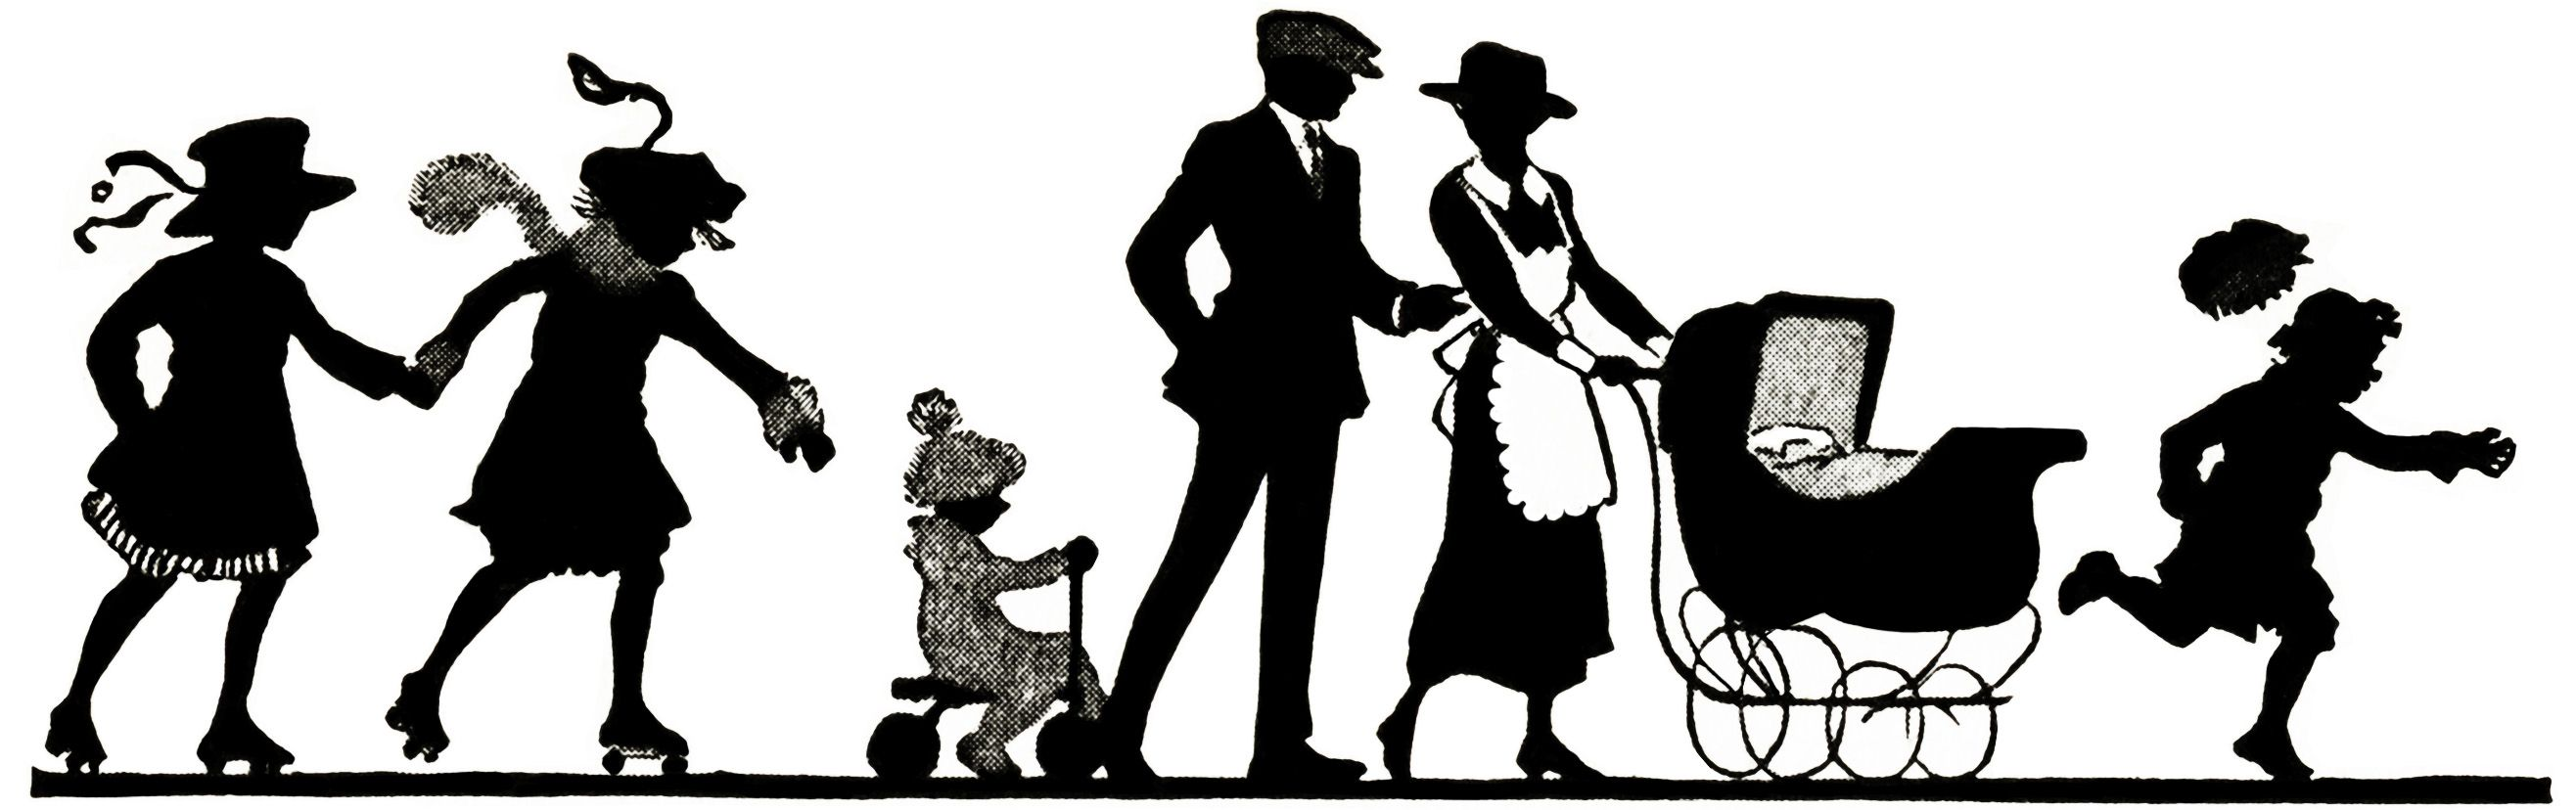 Vintage silhouettes clipart picture transparent library vintage silhouettes | free vintage clipart, family ... picture transparent library